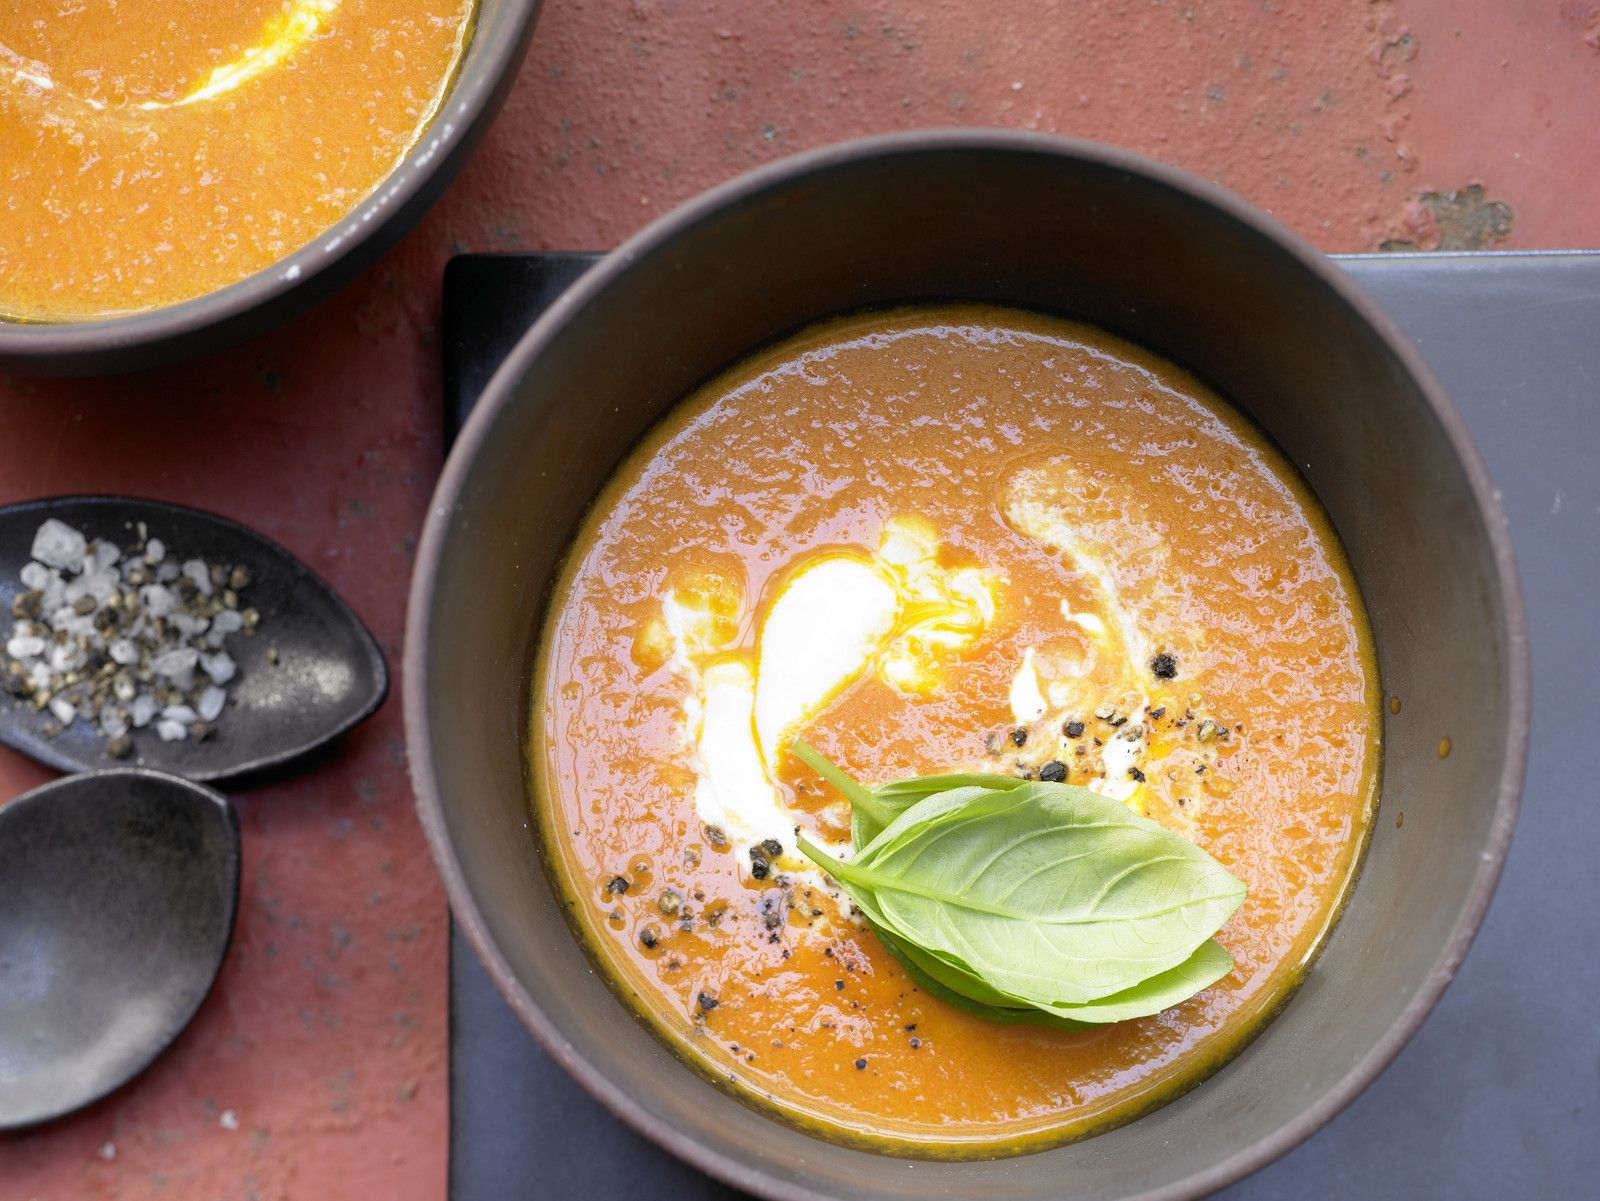 Vegetarische Sommerküche Rezepte : Kochbuch: vegetarische sommergerichte eat smarter